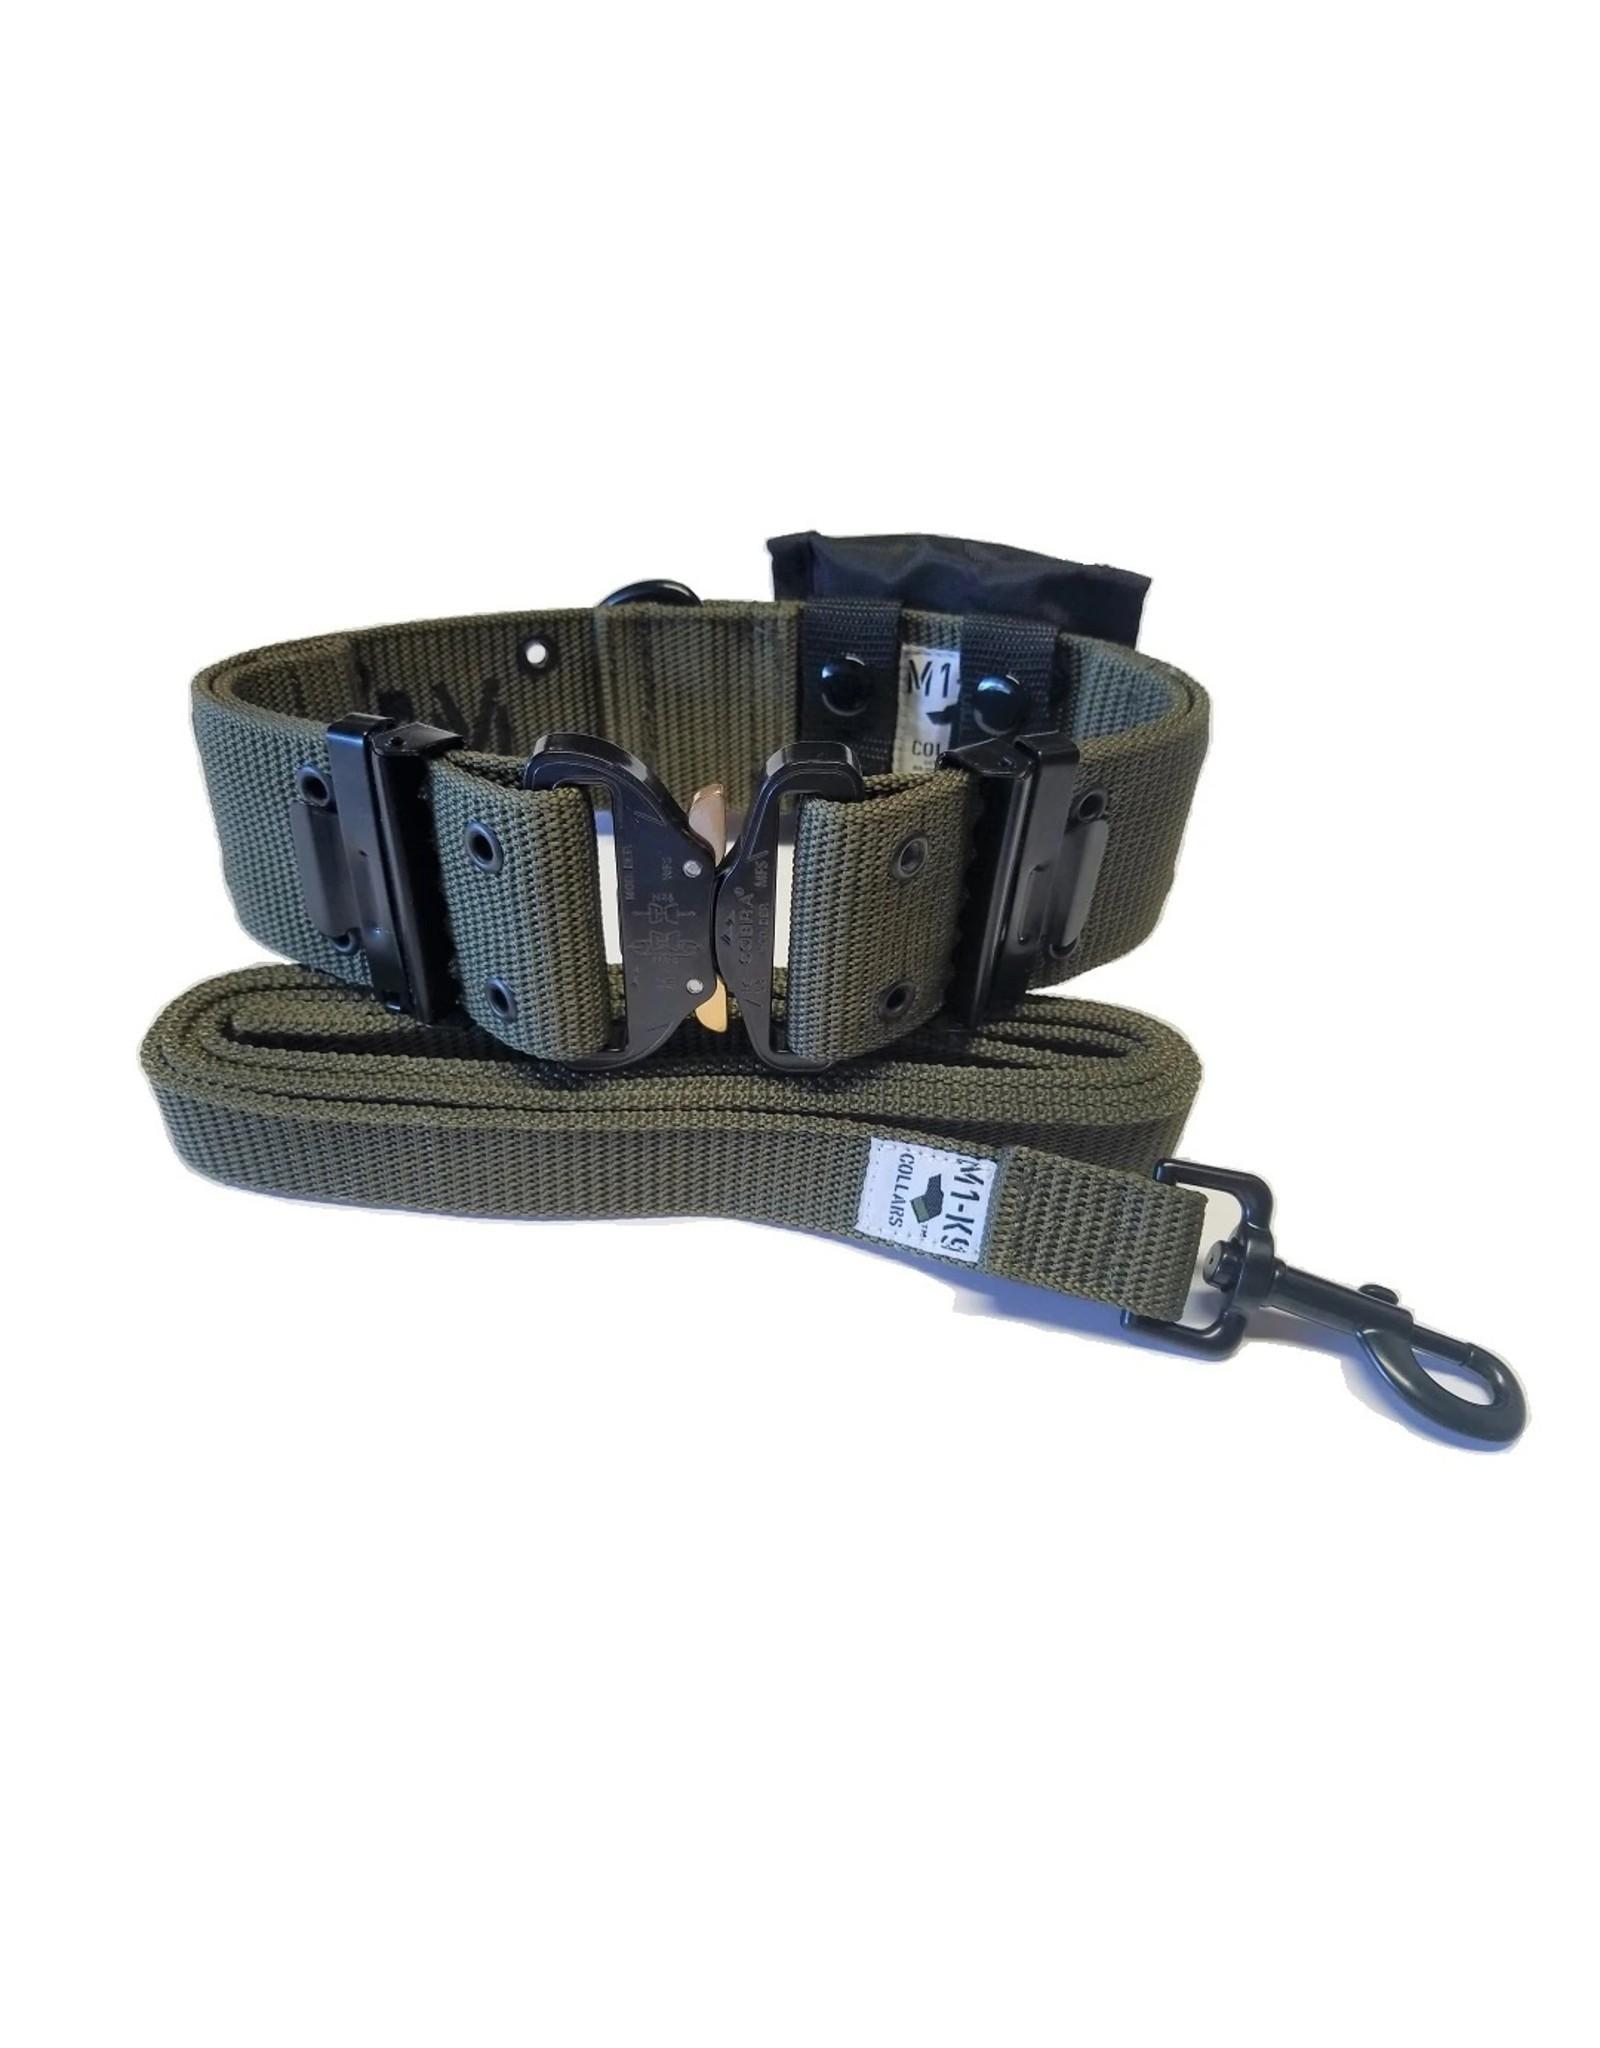 M1-K9 COLLARS M1-K9 LEASH/COLLAR W/HEAVY DUTY BUCKLE